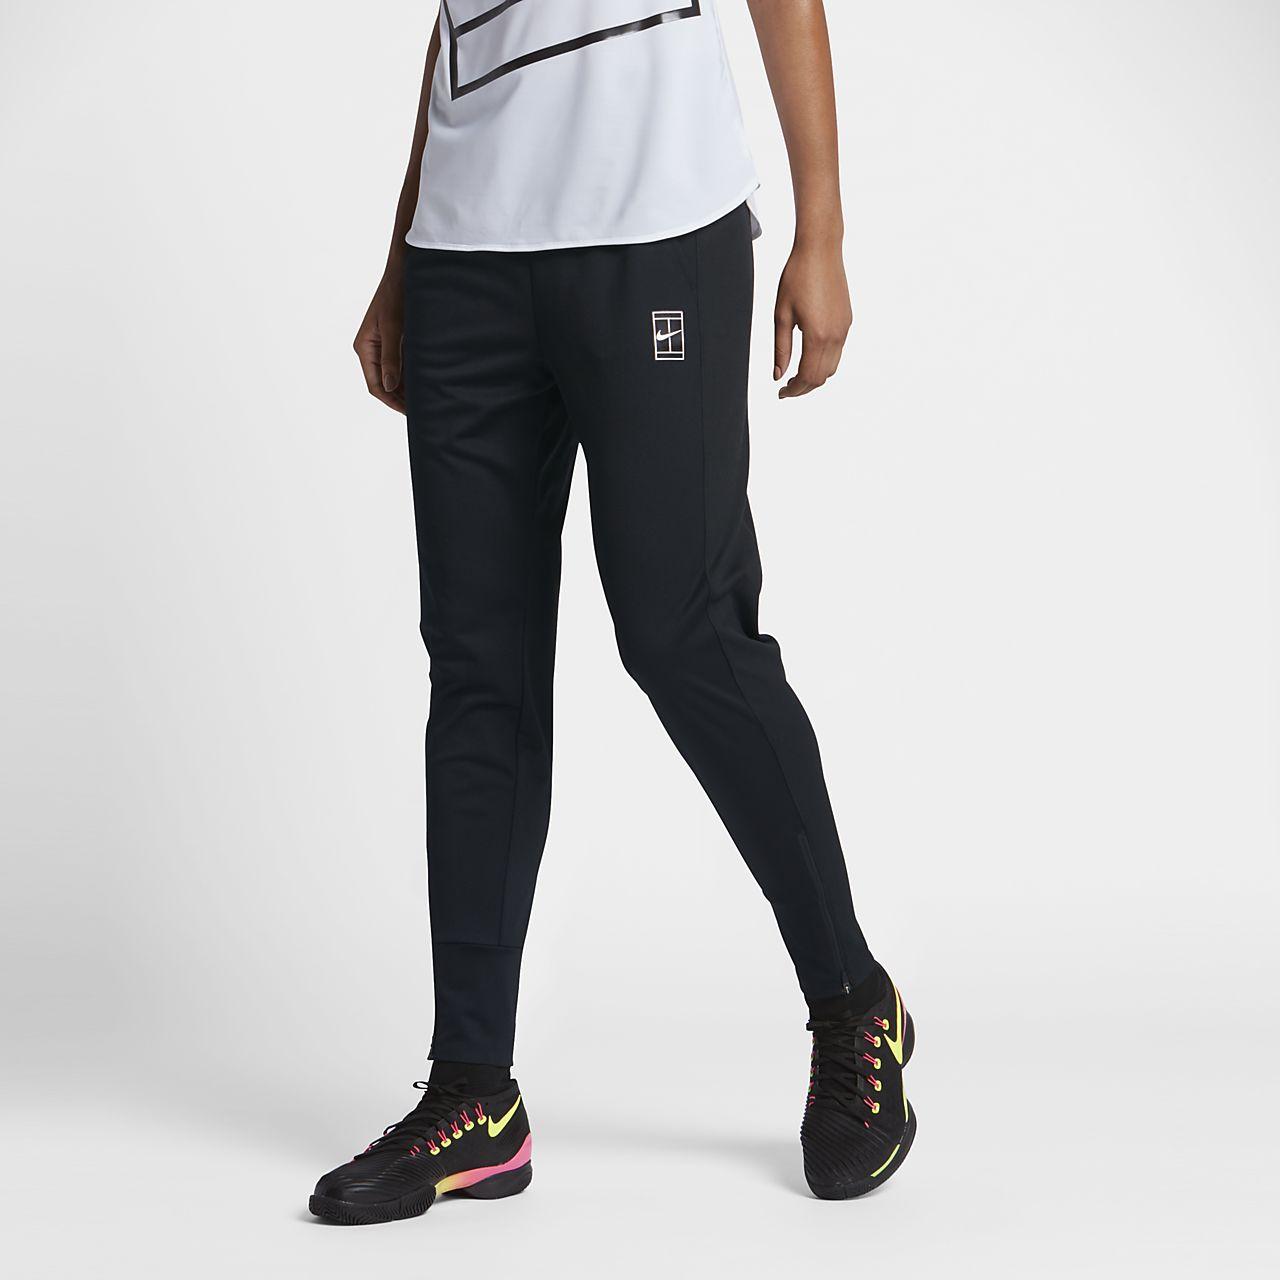 Nike Store Men's Tennis Trousers